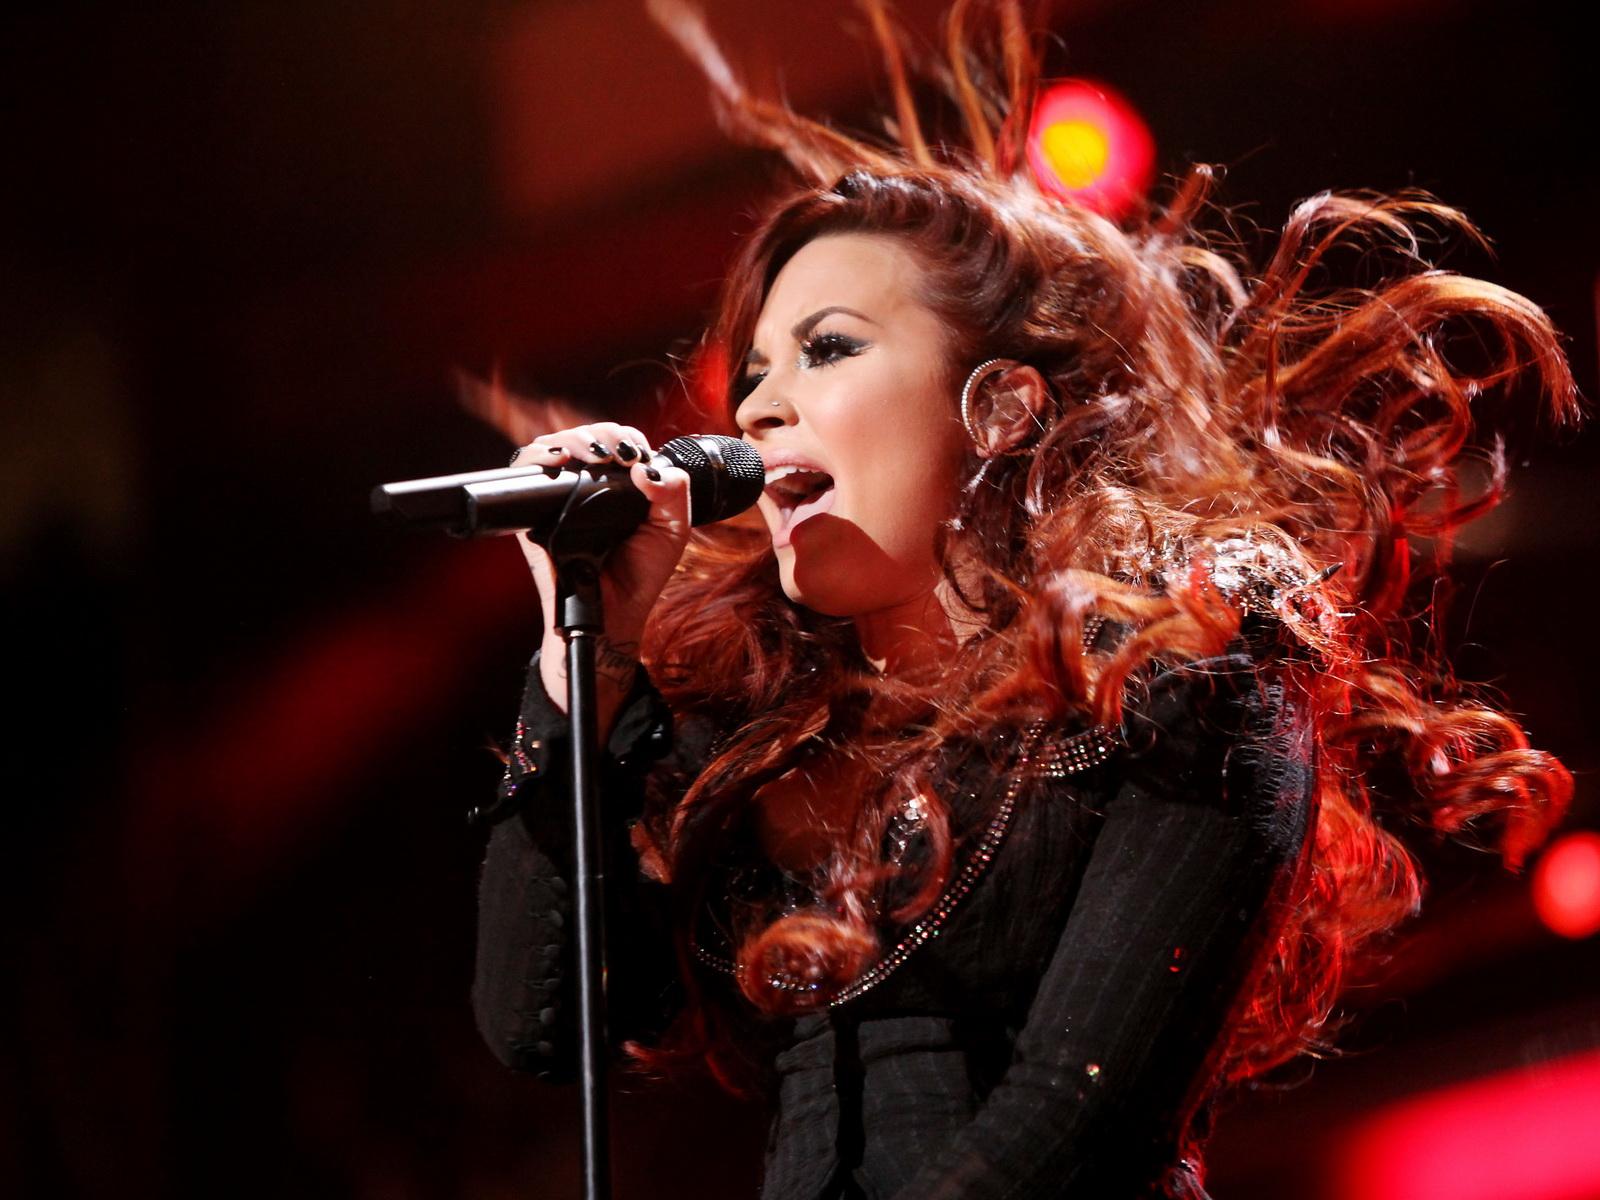 http://3.bp.blogspot.com/-iMz_bVIXGgk/UAC0CLUo0vI/AAAAAAAAH3Q/QFb9QVGqTnA/s1600/Demi-Lovato18.jpg